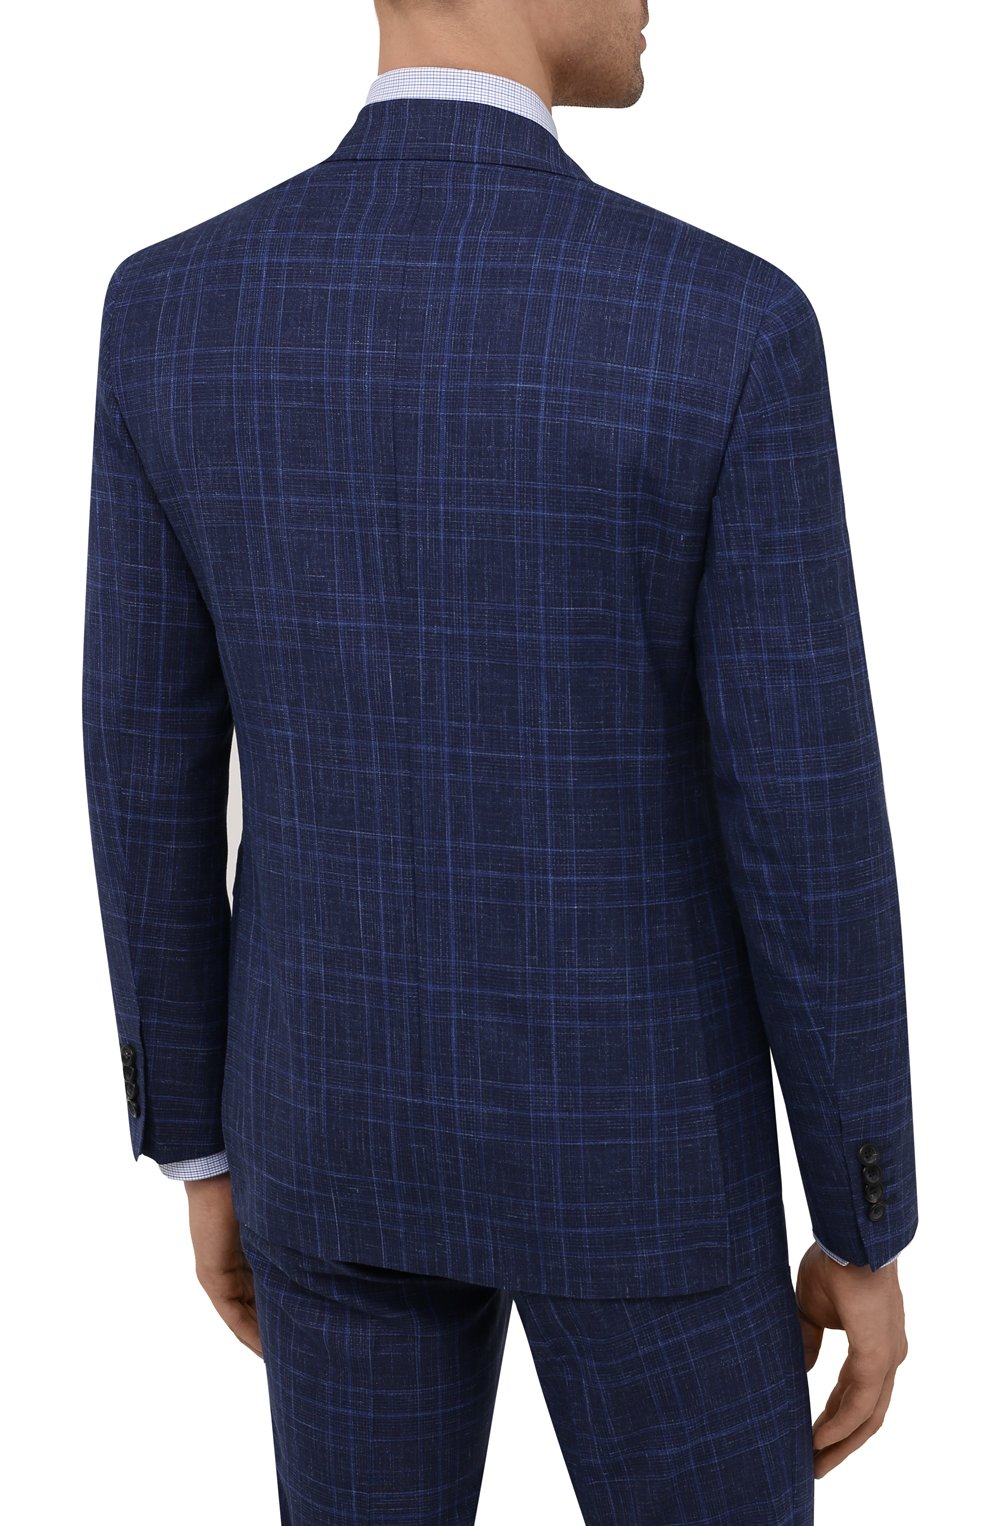 Мужской костюм из шерсти и шелка CANALI темно-синего цвета, арт. 25270/53/BF03199 | Фото 3